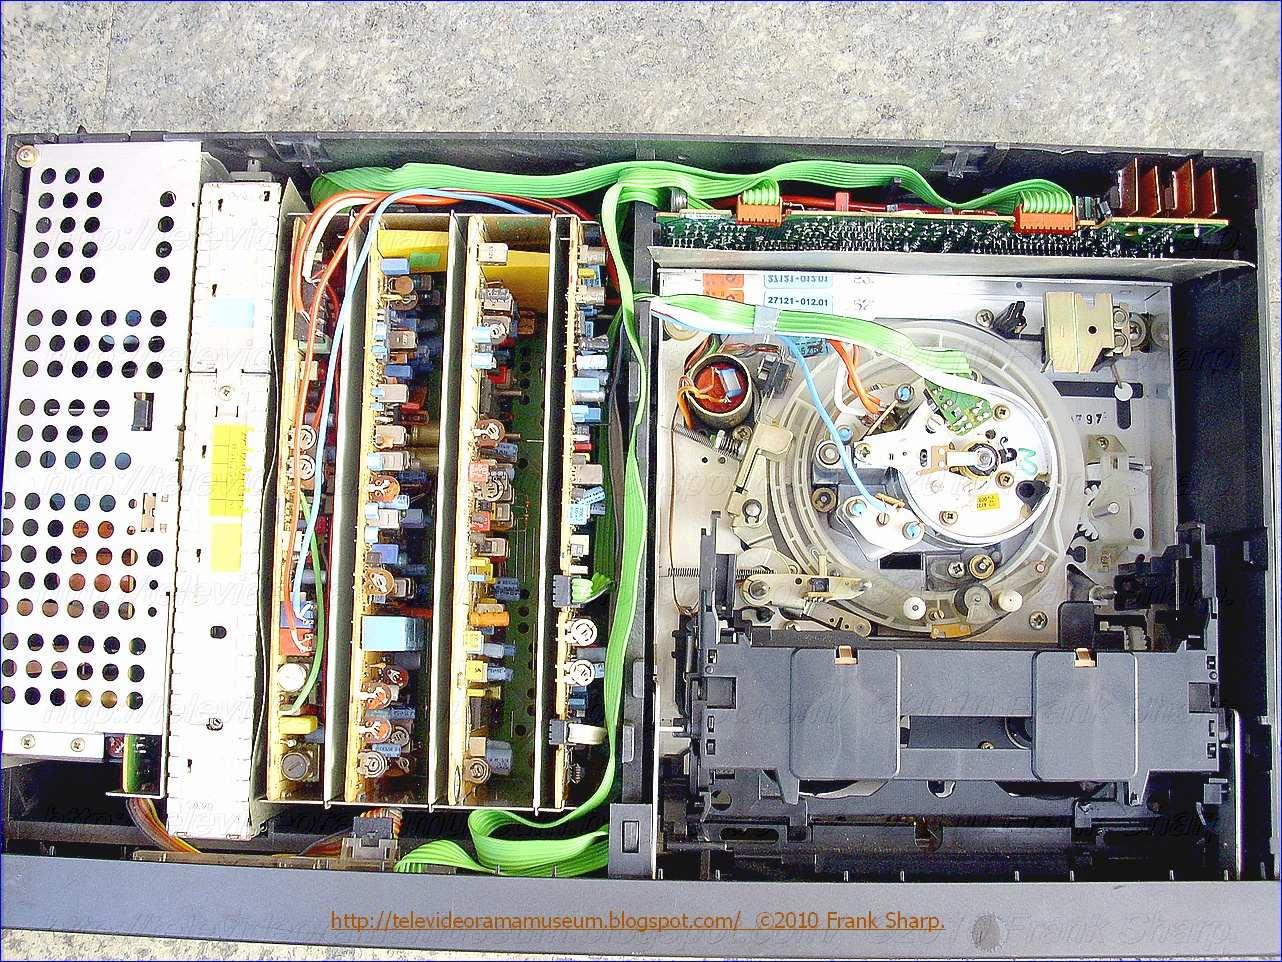 Tele Video Rama Museum !: GRUNDIG VIDEO 2X4 STEREO 2200 CHASSIS ...